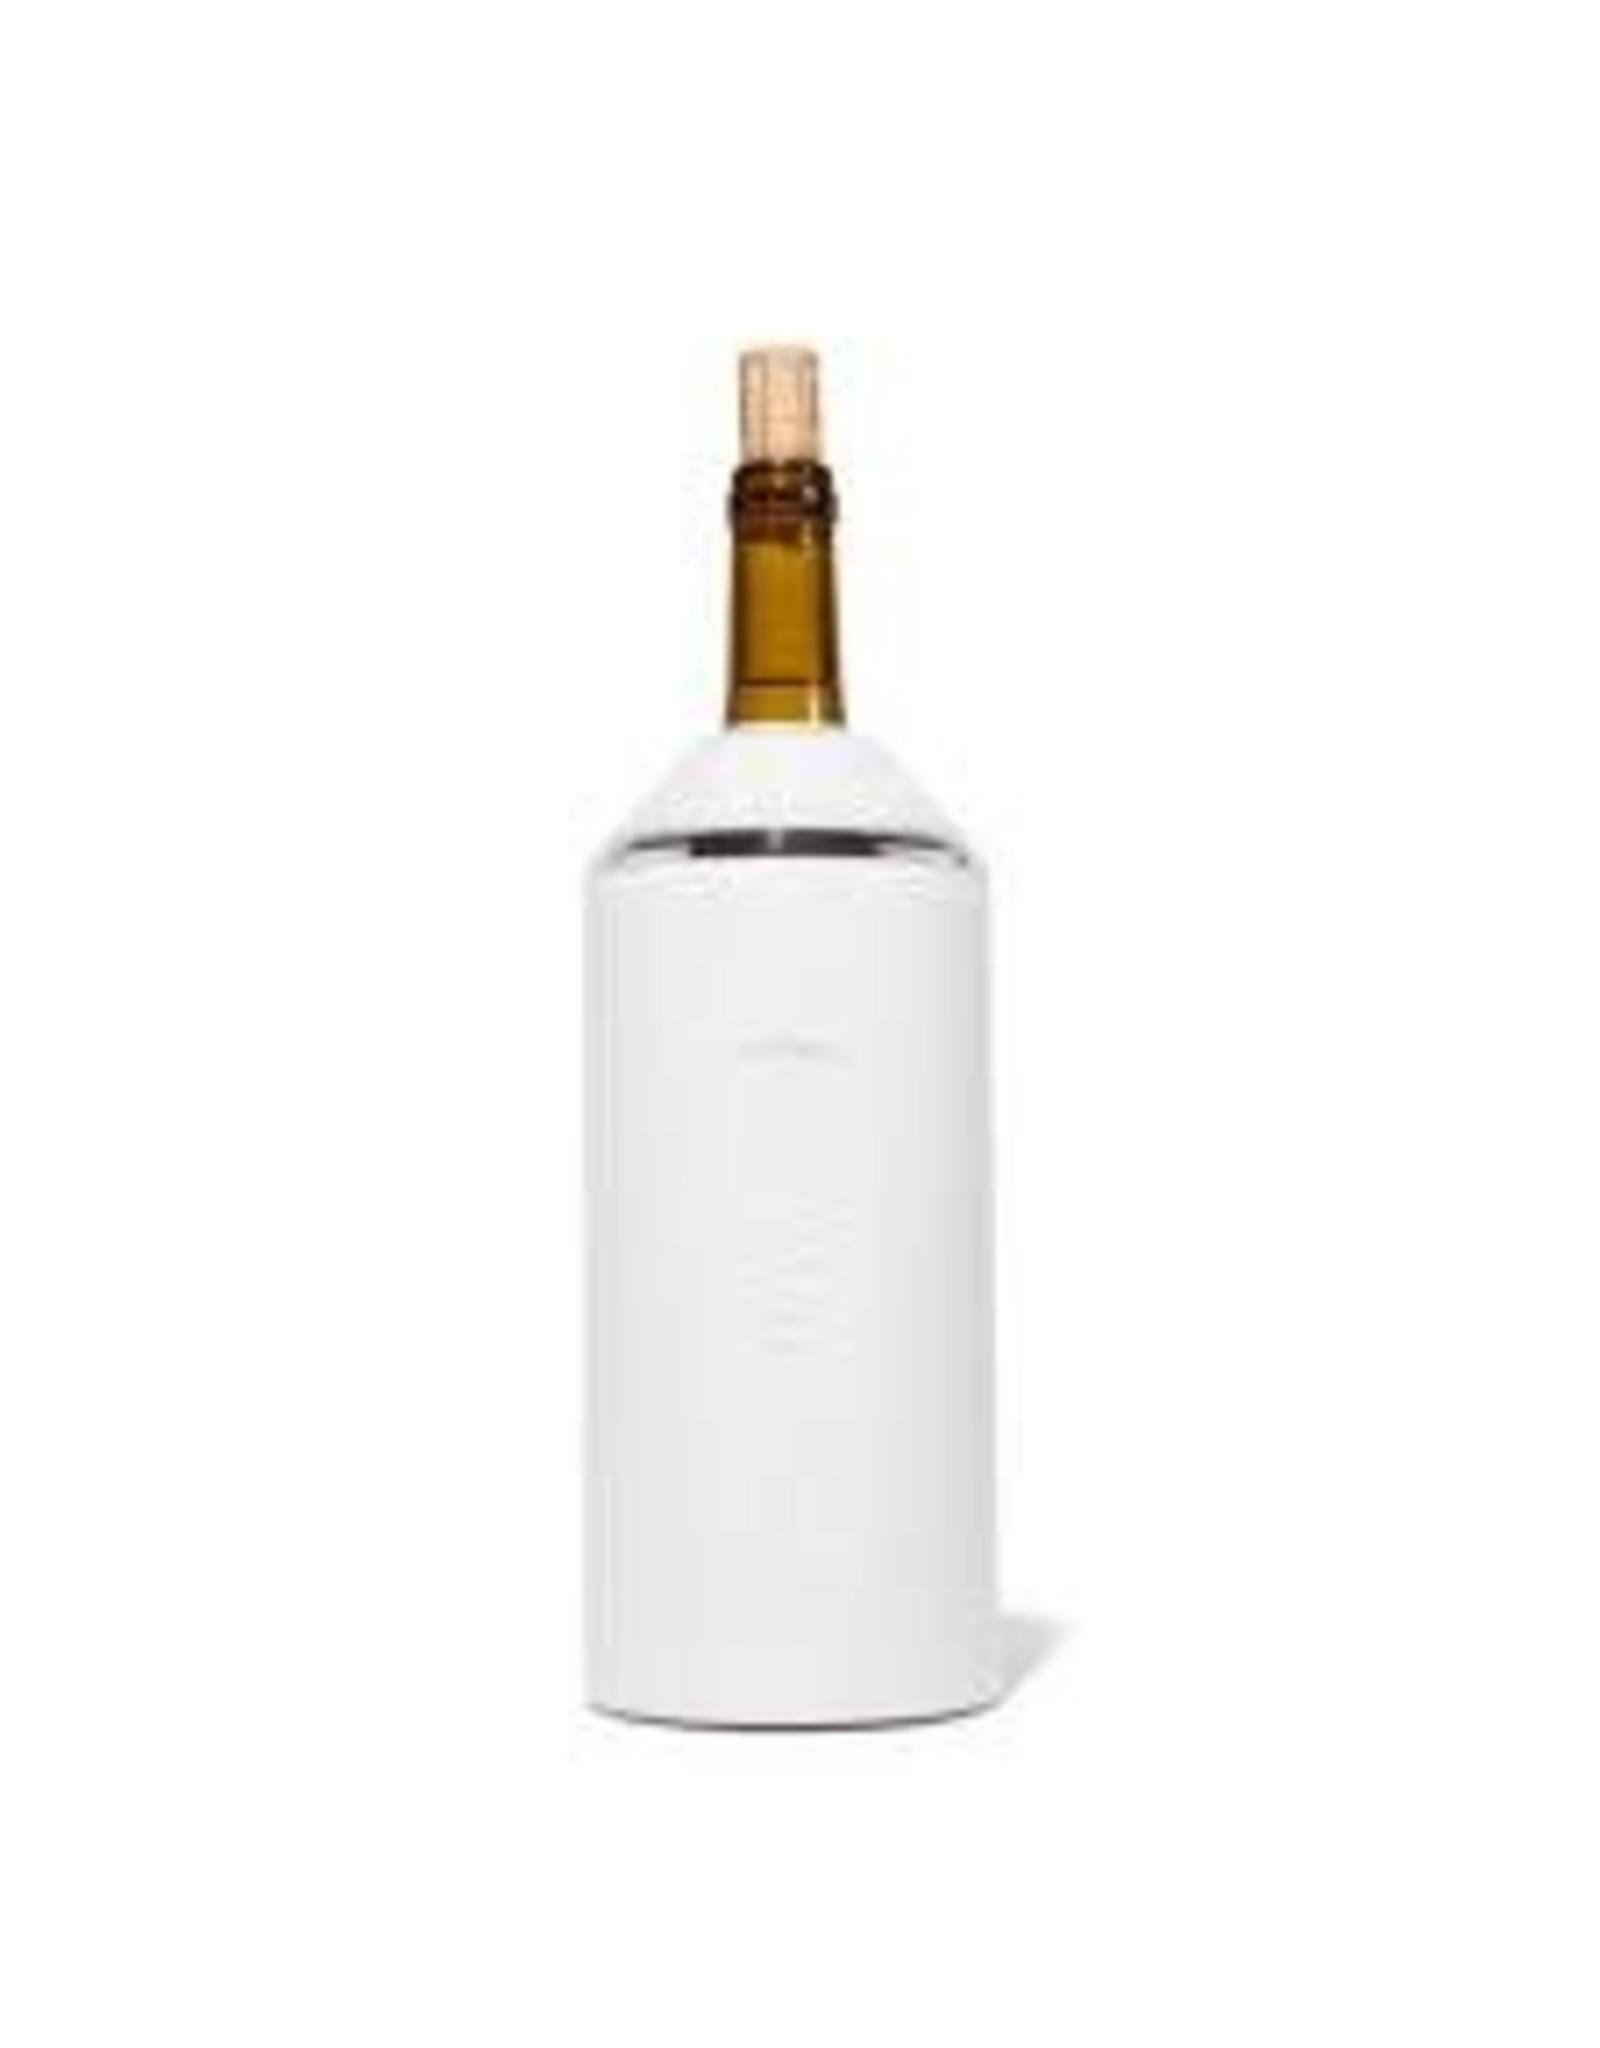 Vinglace VINGLACE Wine Chiller White